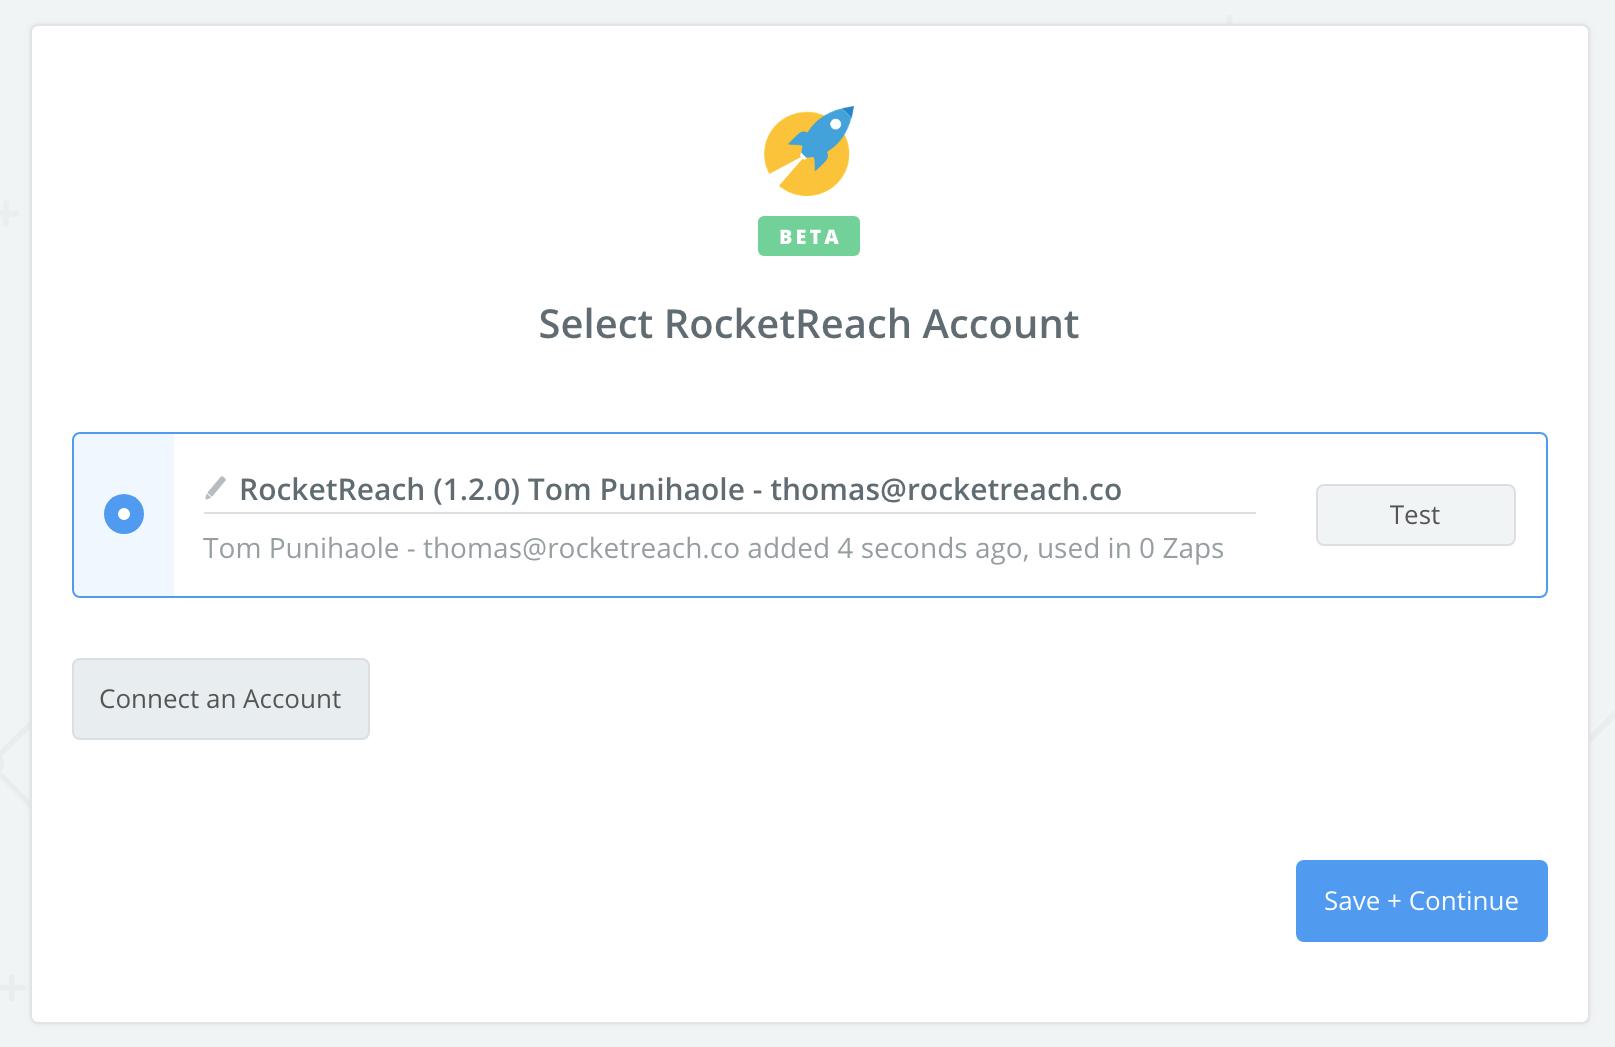 RocketReach connection successful